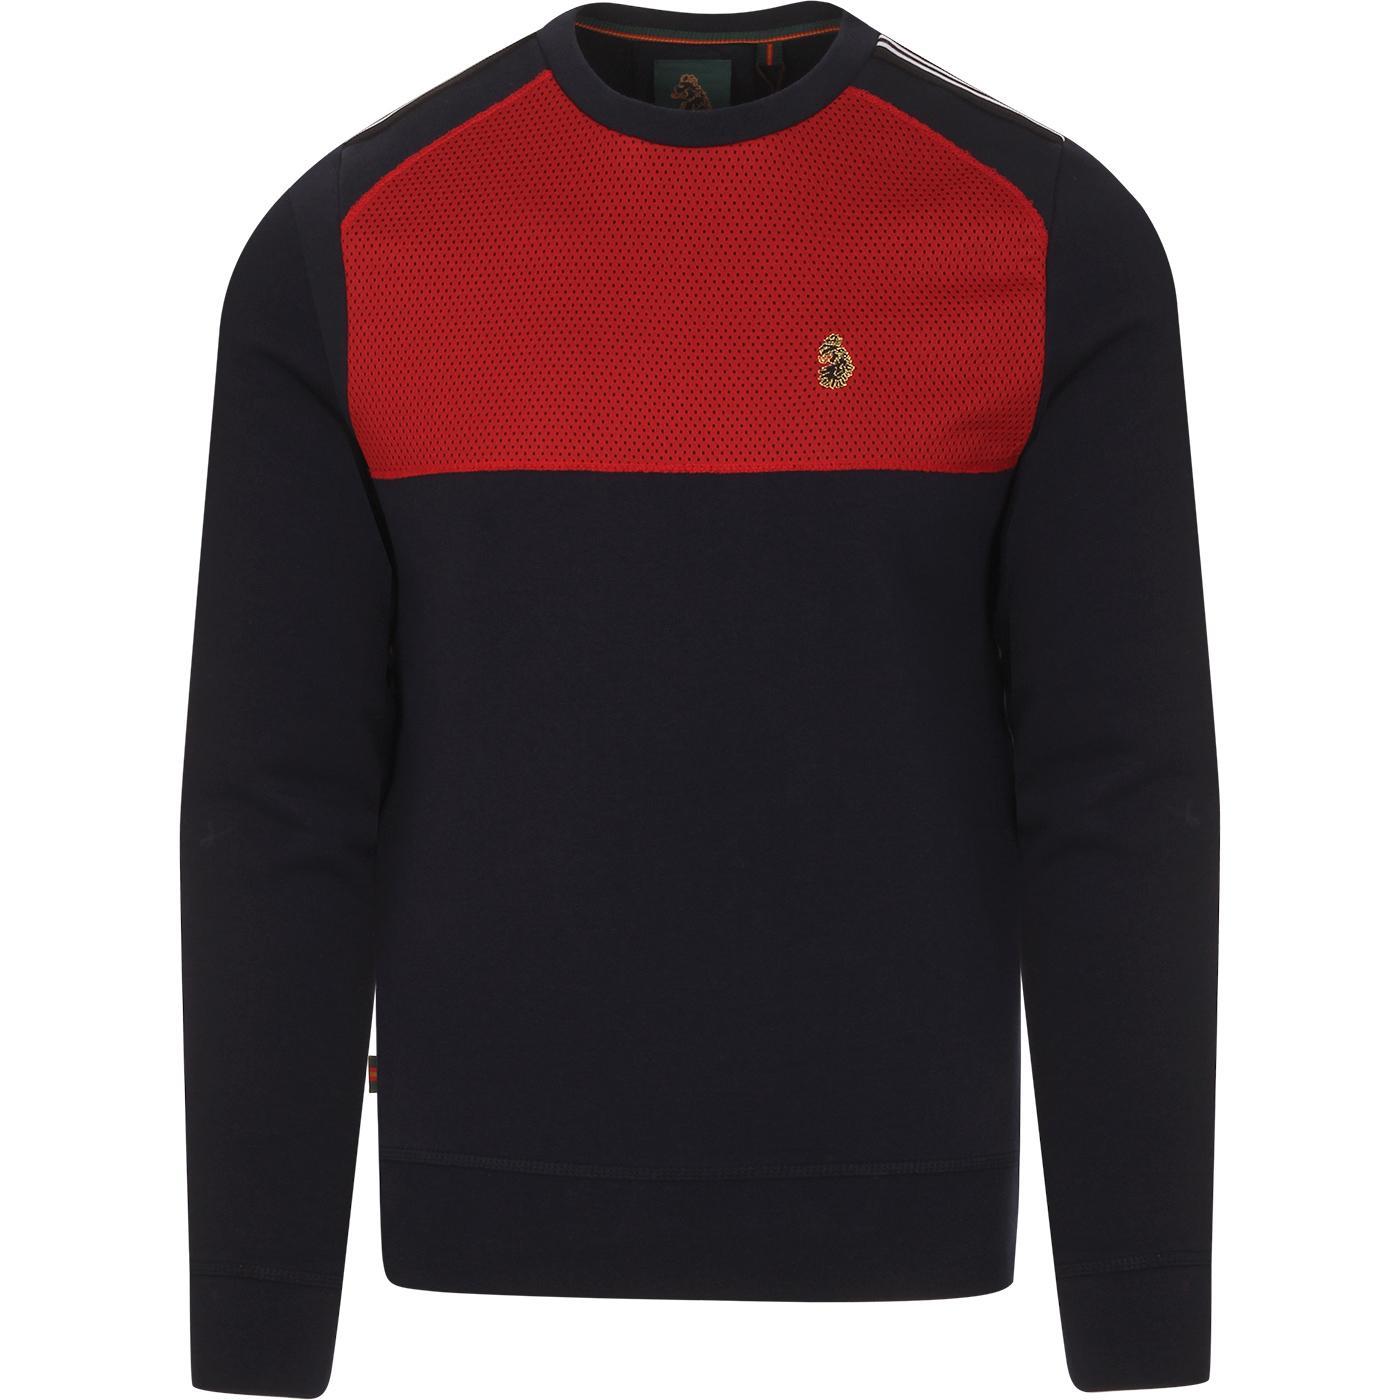 Marco LUKE Retro Perf Panel Retro Sweatshirt (DN)